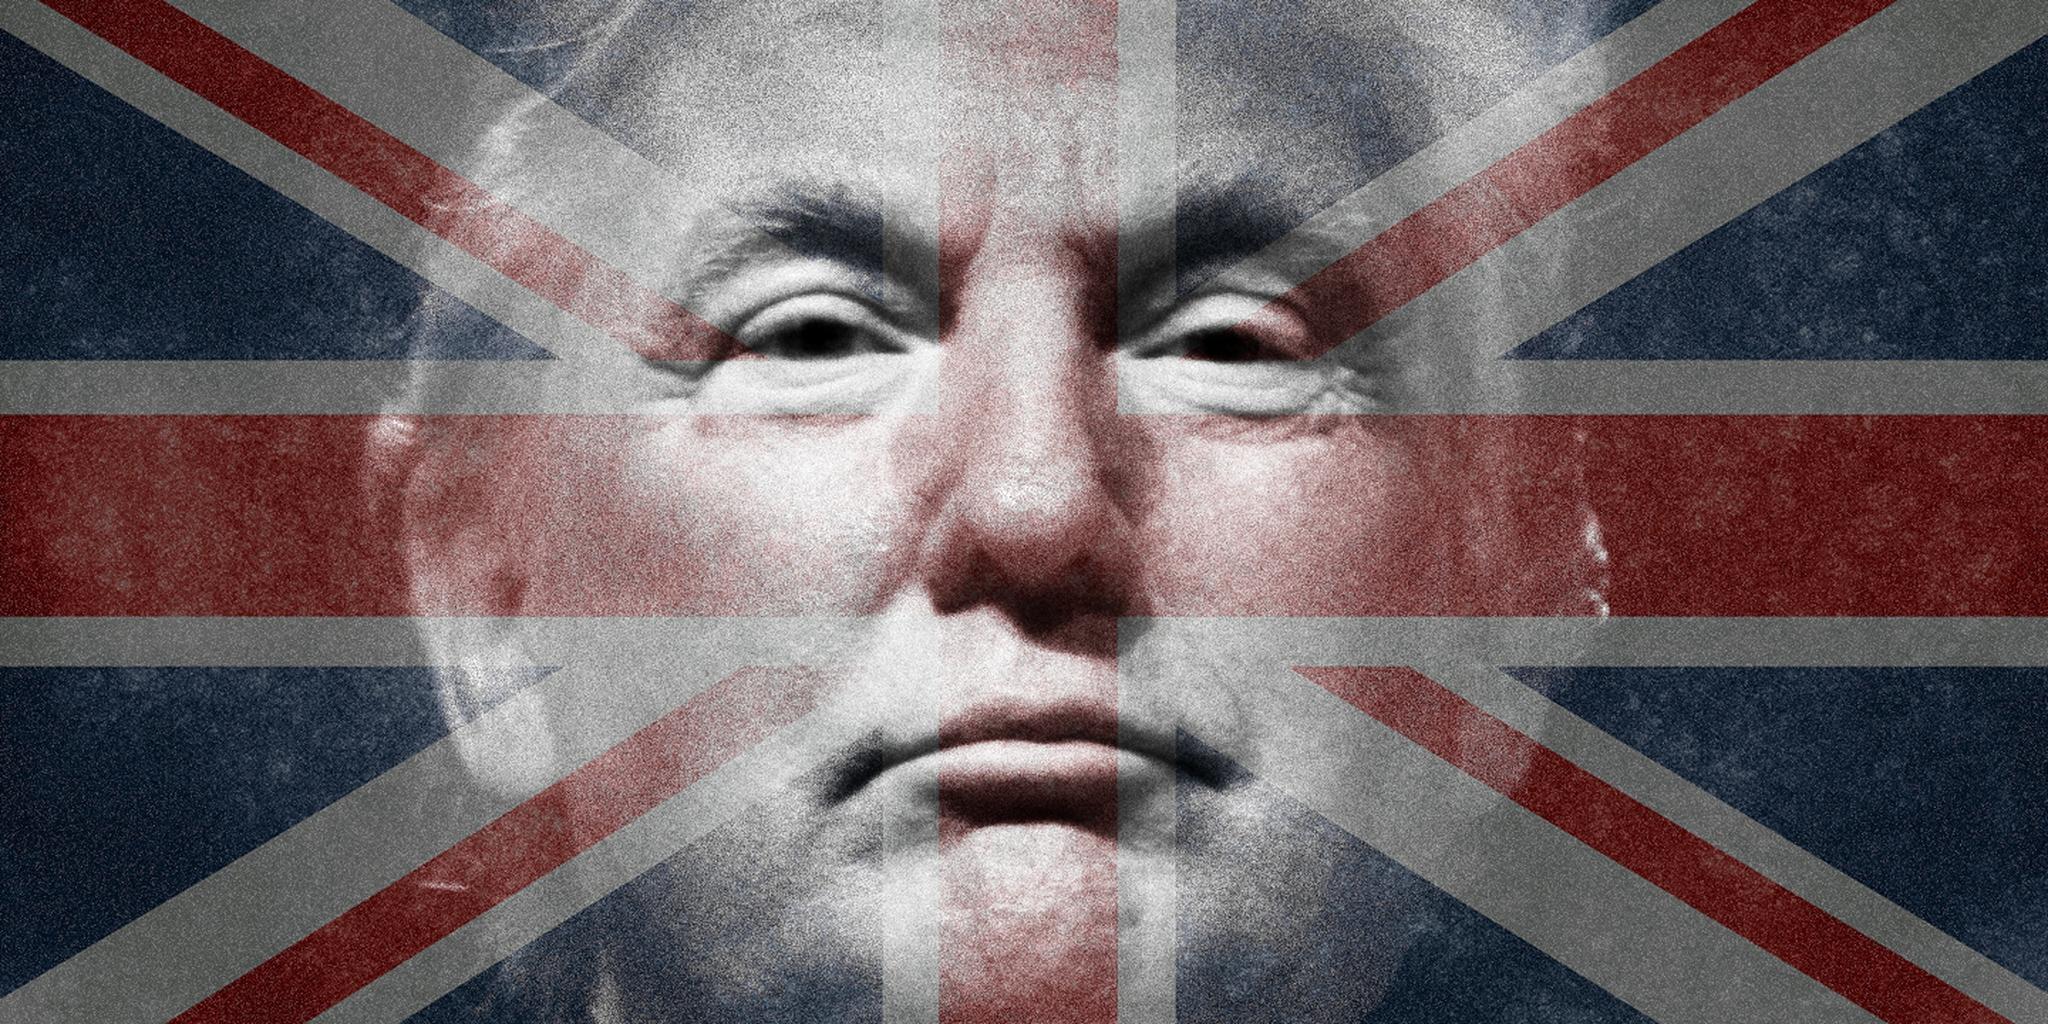 Donald Trump with Union Jack flag overlay